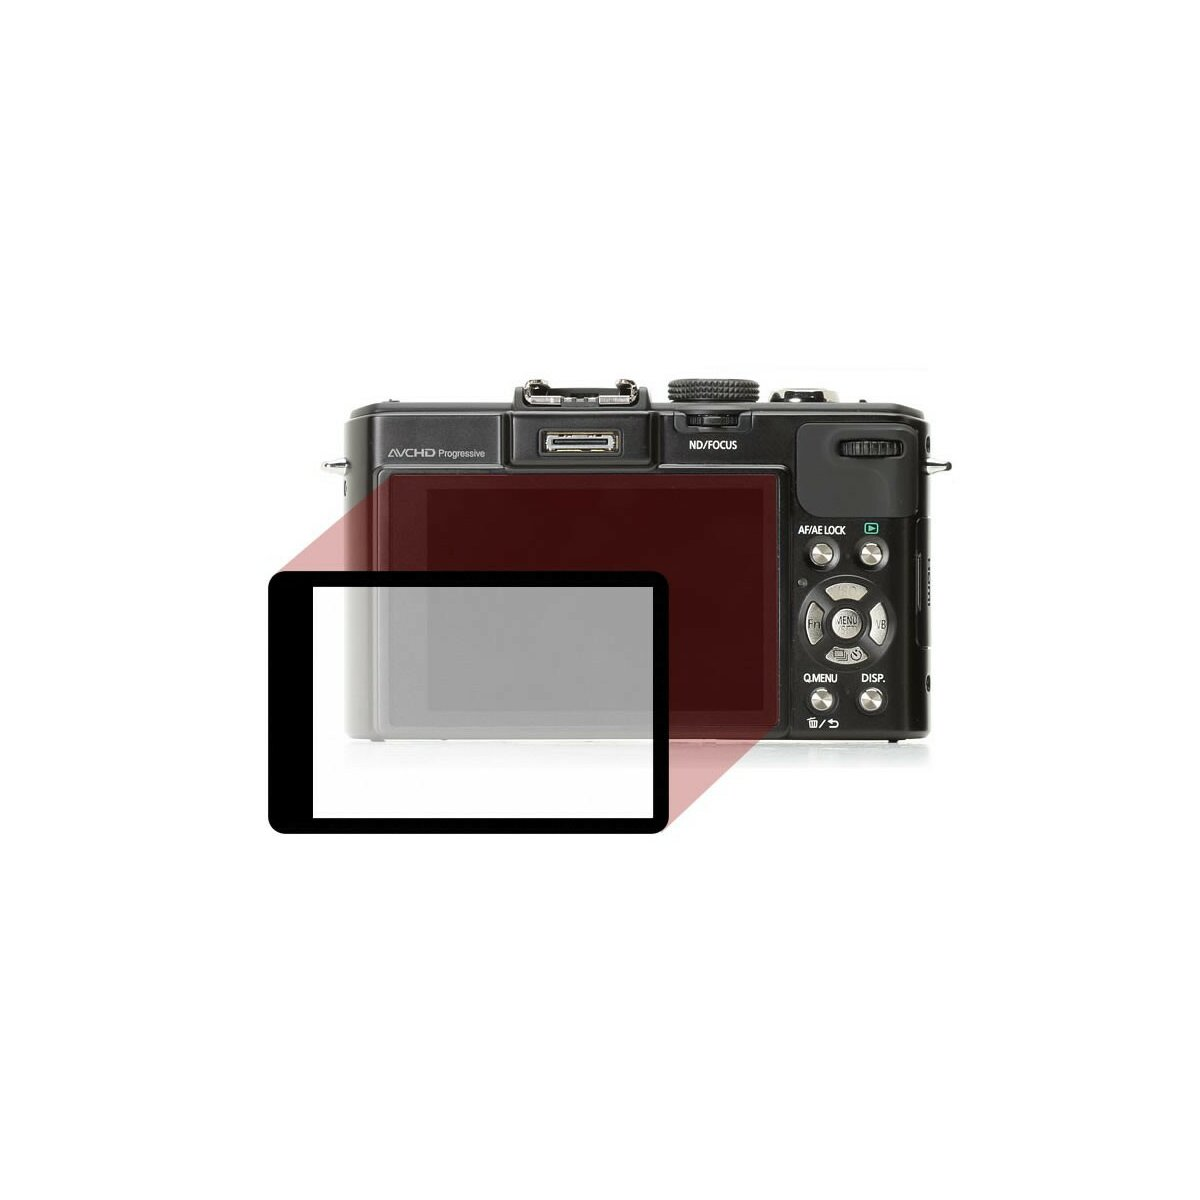 LCD Displayschutz Protector fuer Panasonic DMC-LX7